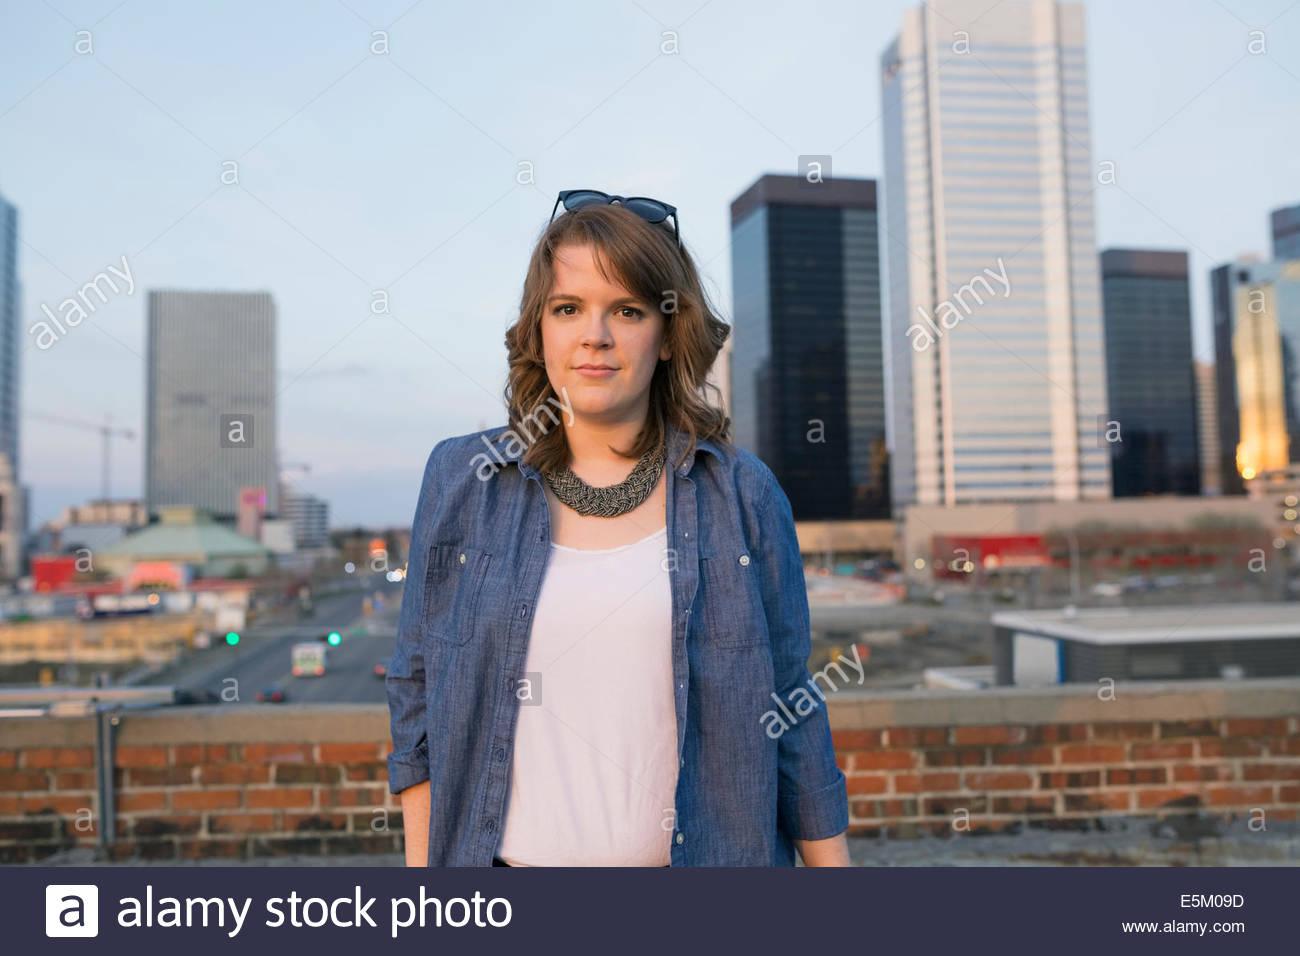 Retrato de mujer en terraza urbana Imagen De Stock